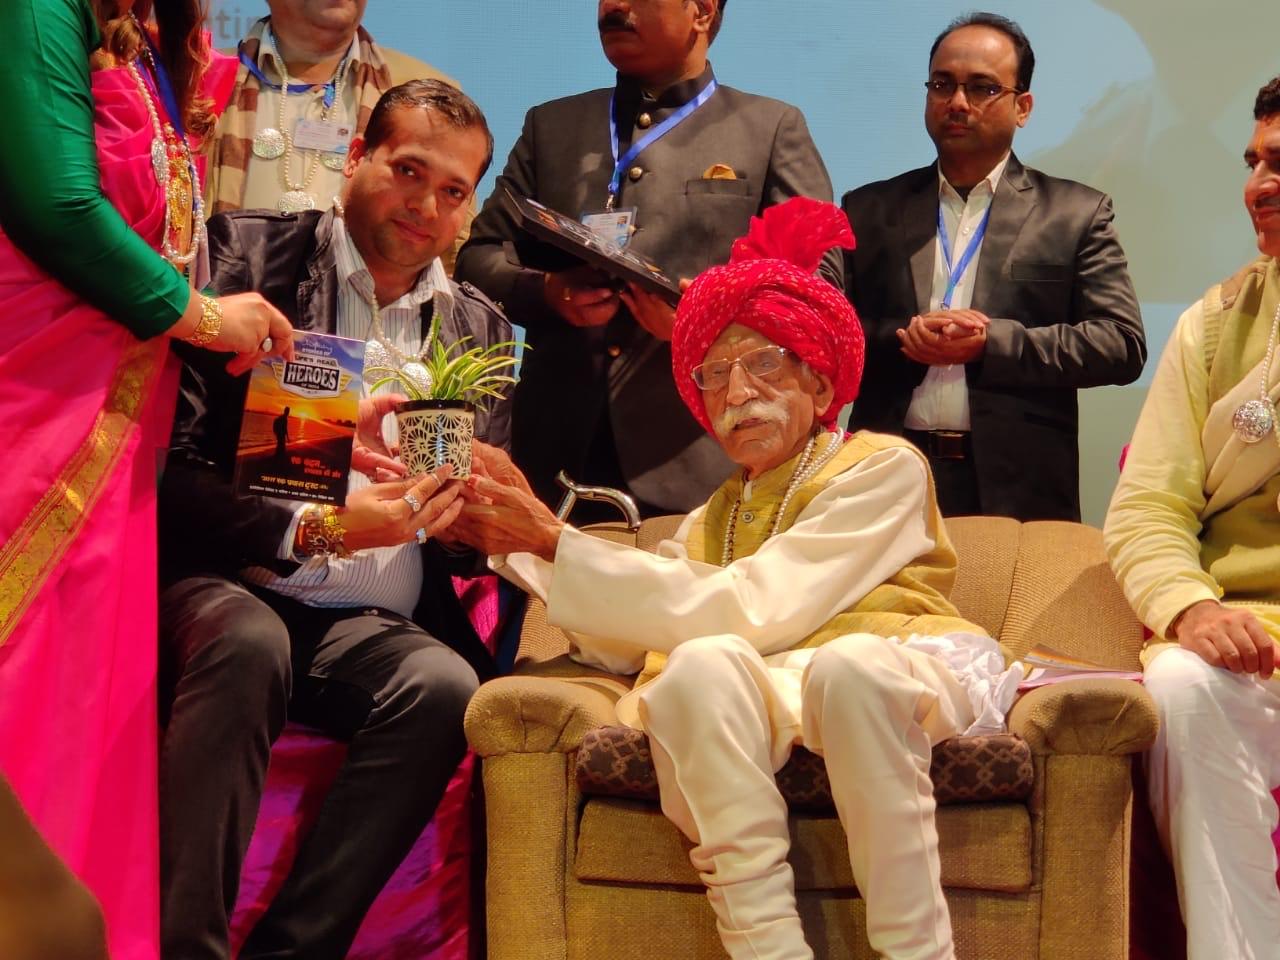 Ajay Harinath Singh, Darwin Platform: A Genius, a Great Indian Entrepreneur